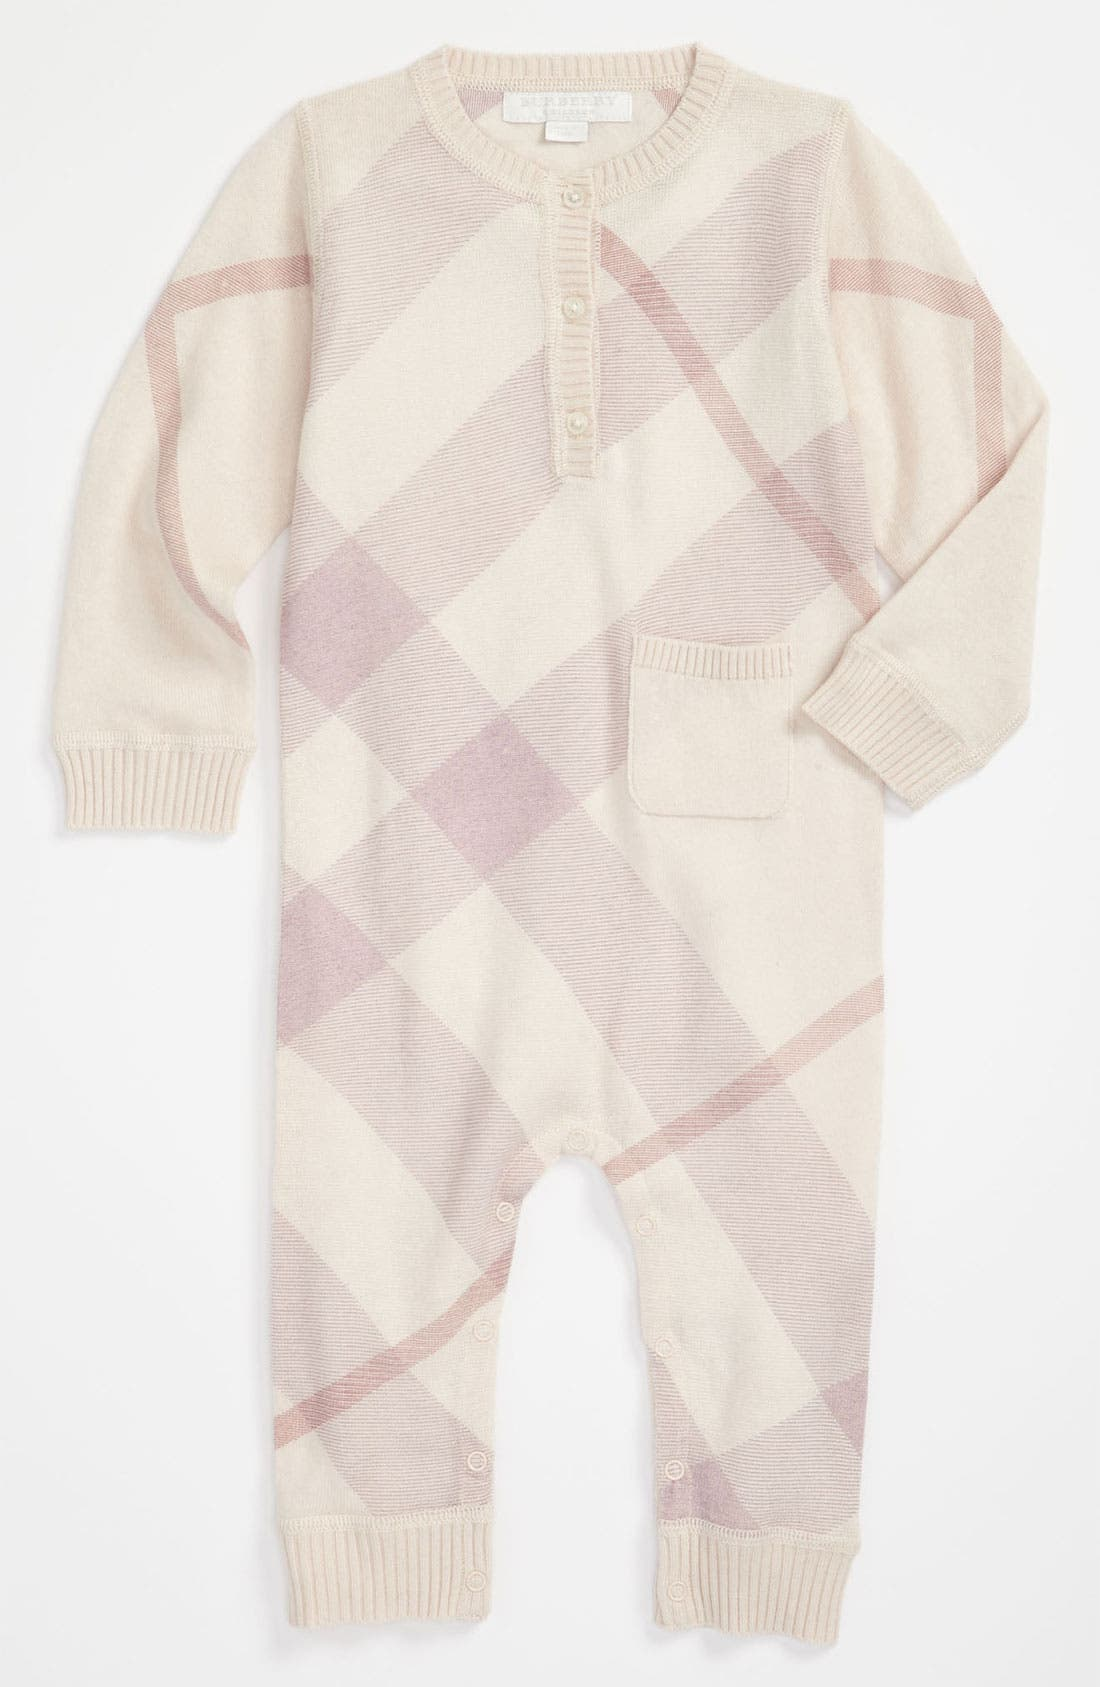 Alternate Image 1 Selected - Burberry Check Print Cashmere & Cotton Bodysuit (Infant)